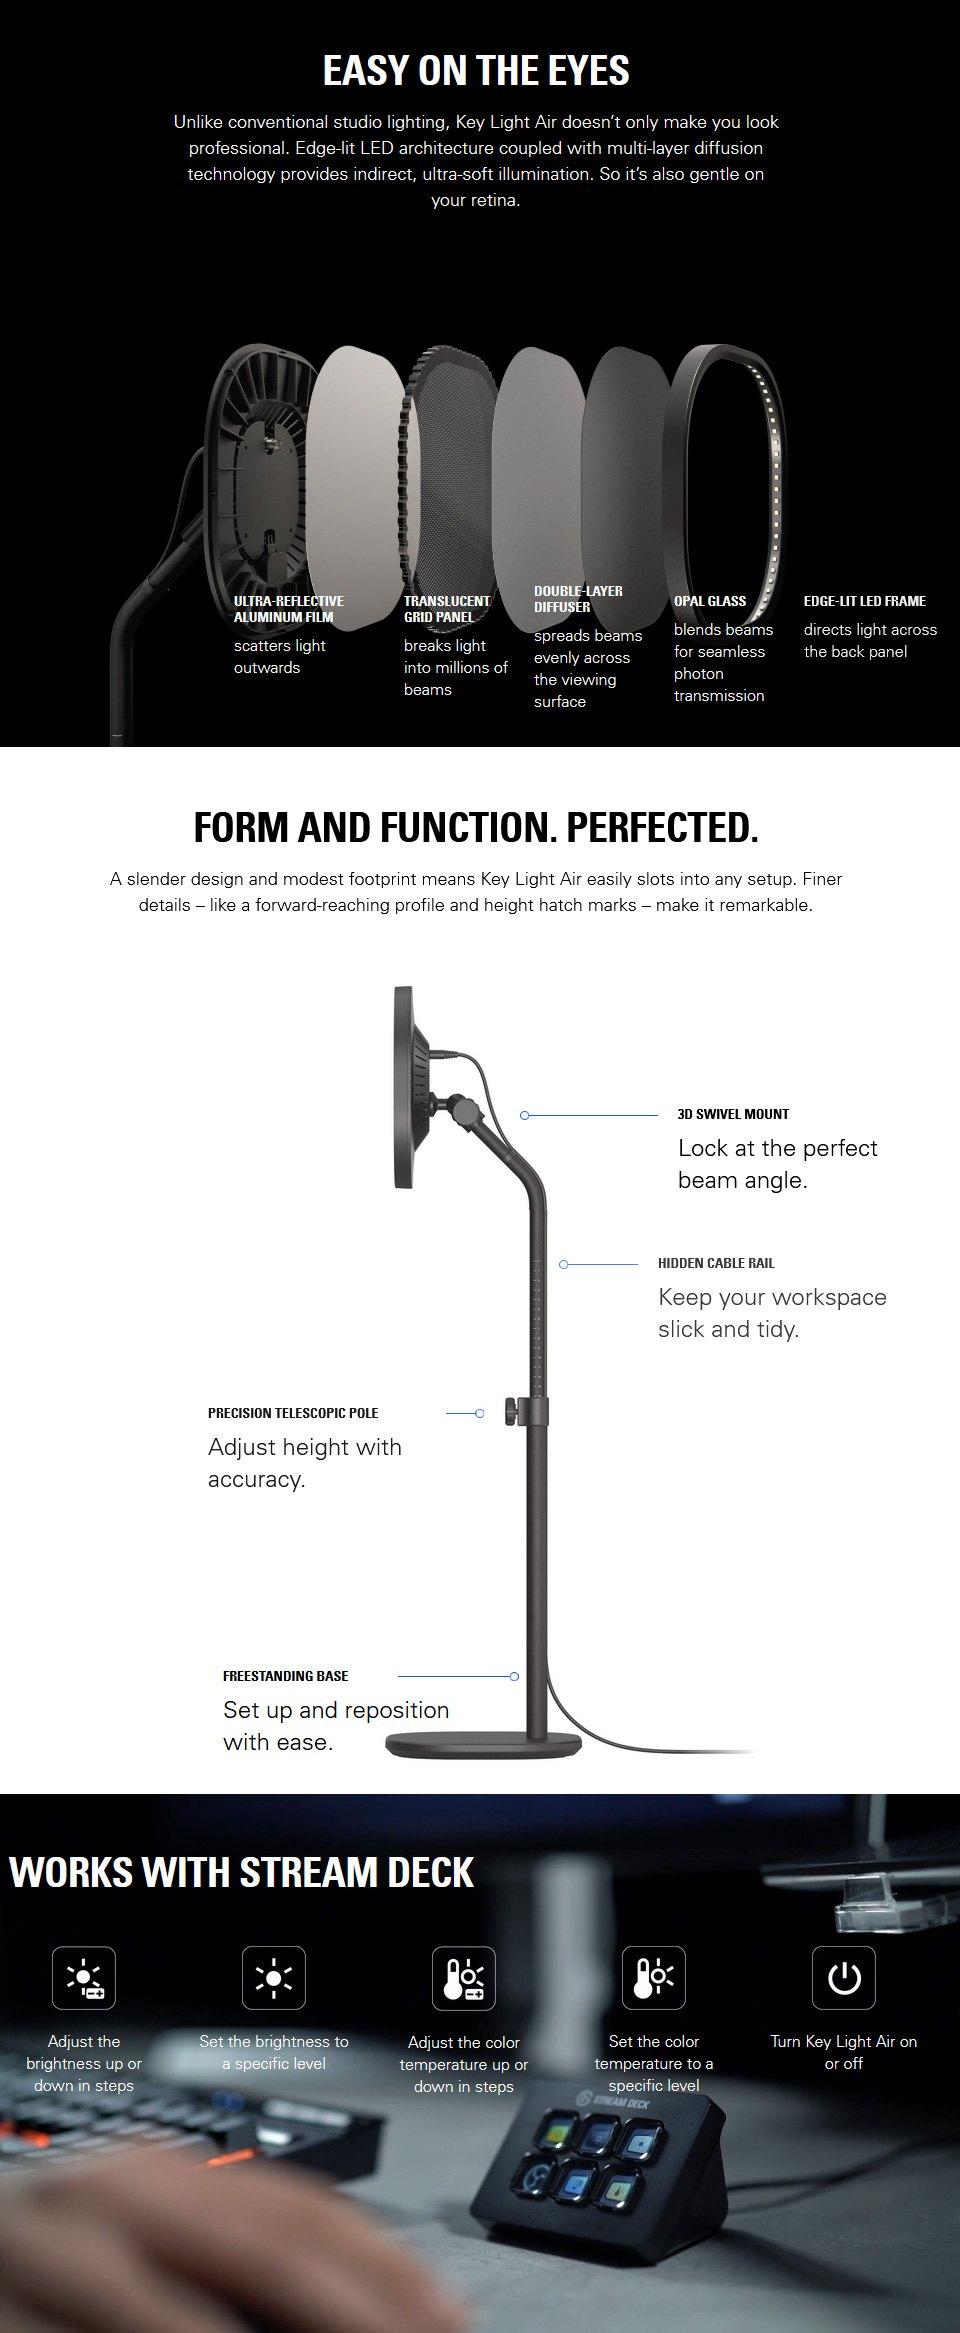 Elgato Key Light Air LED Panel features 2